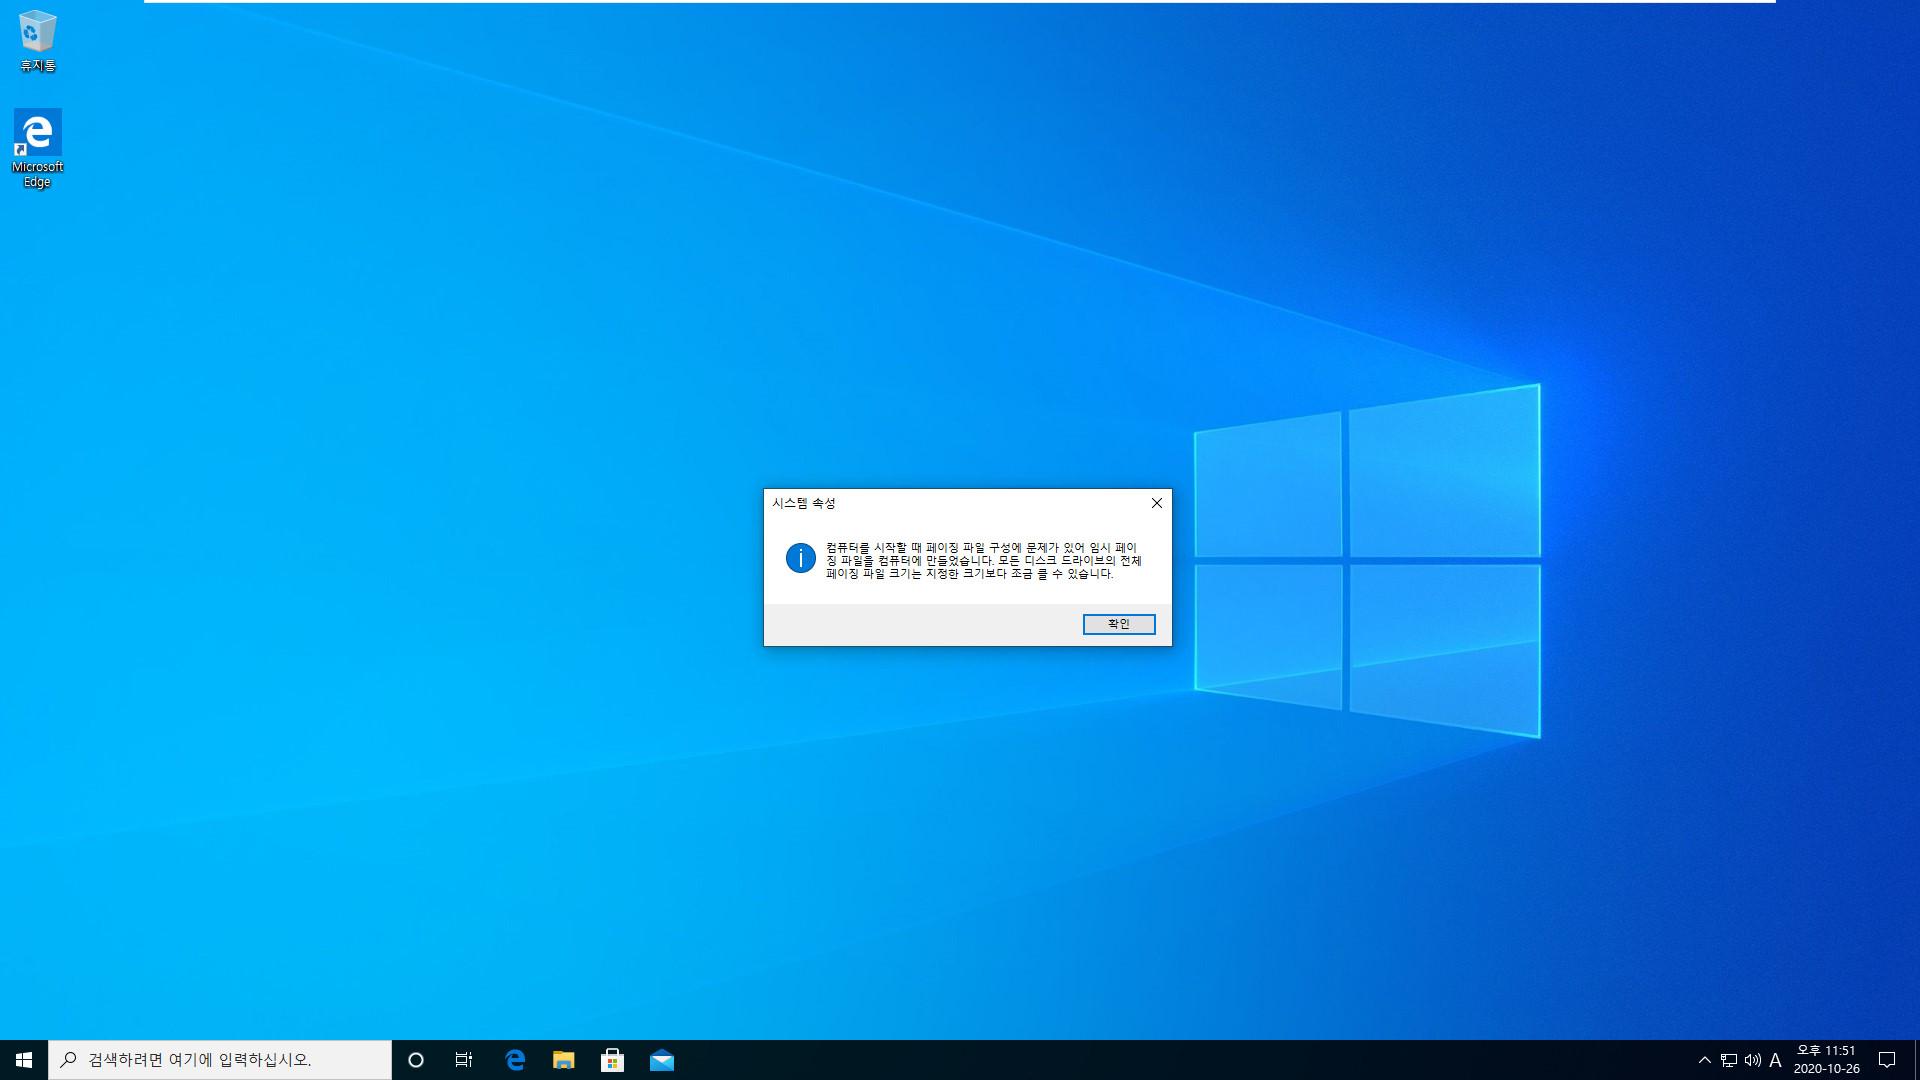 exFAT 포맷으로도 VHD 부팅이 Windows 10 버전 1903부터 된다고 하여 테스트 - 생고생만 하다가 컴퓨터 먹통 2번이나 되고 그만뒀습니다 2020-10-26_235156.jpg